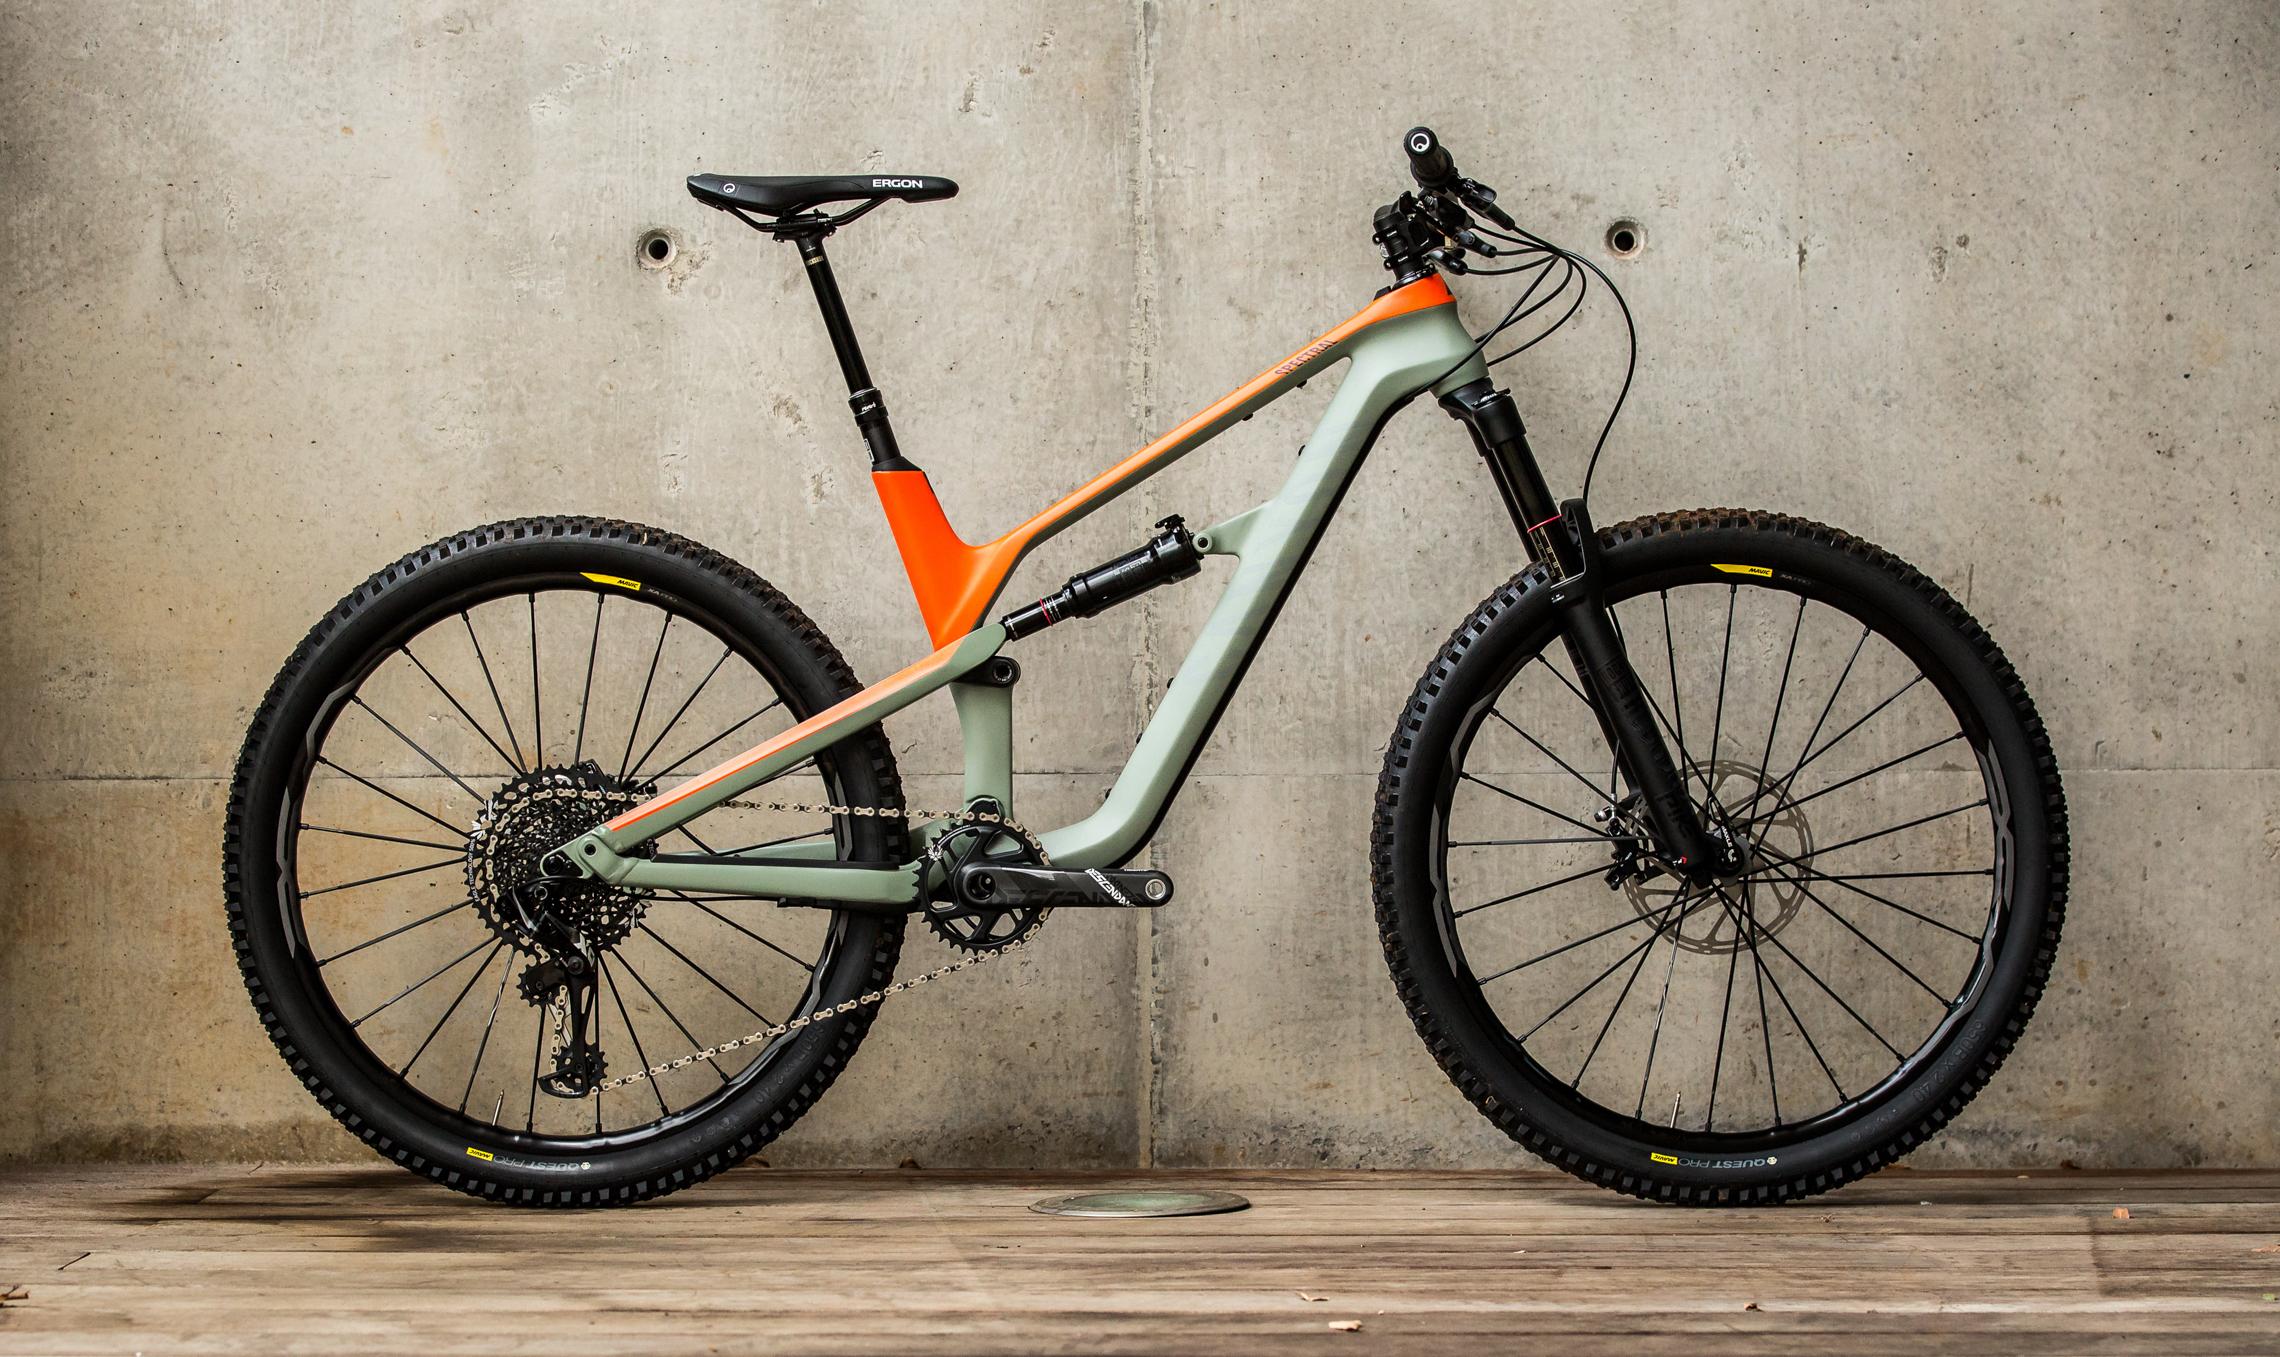 neues canyon spectral 2018 erster test des trailbike. Black Bedroom Furniture Sets. Home Design Ideas